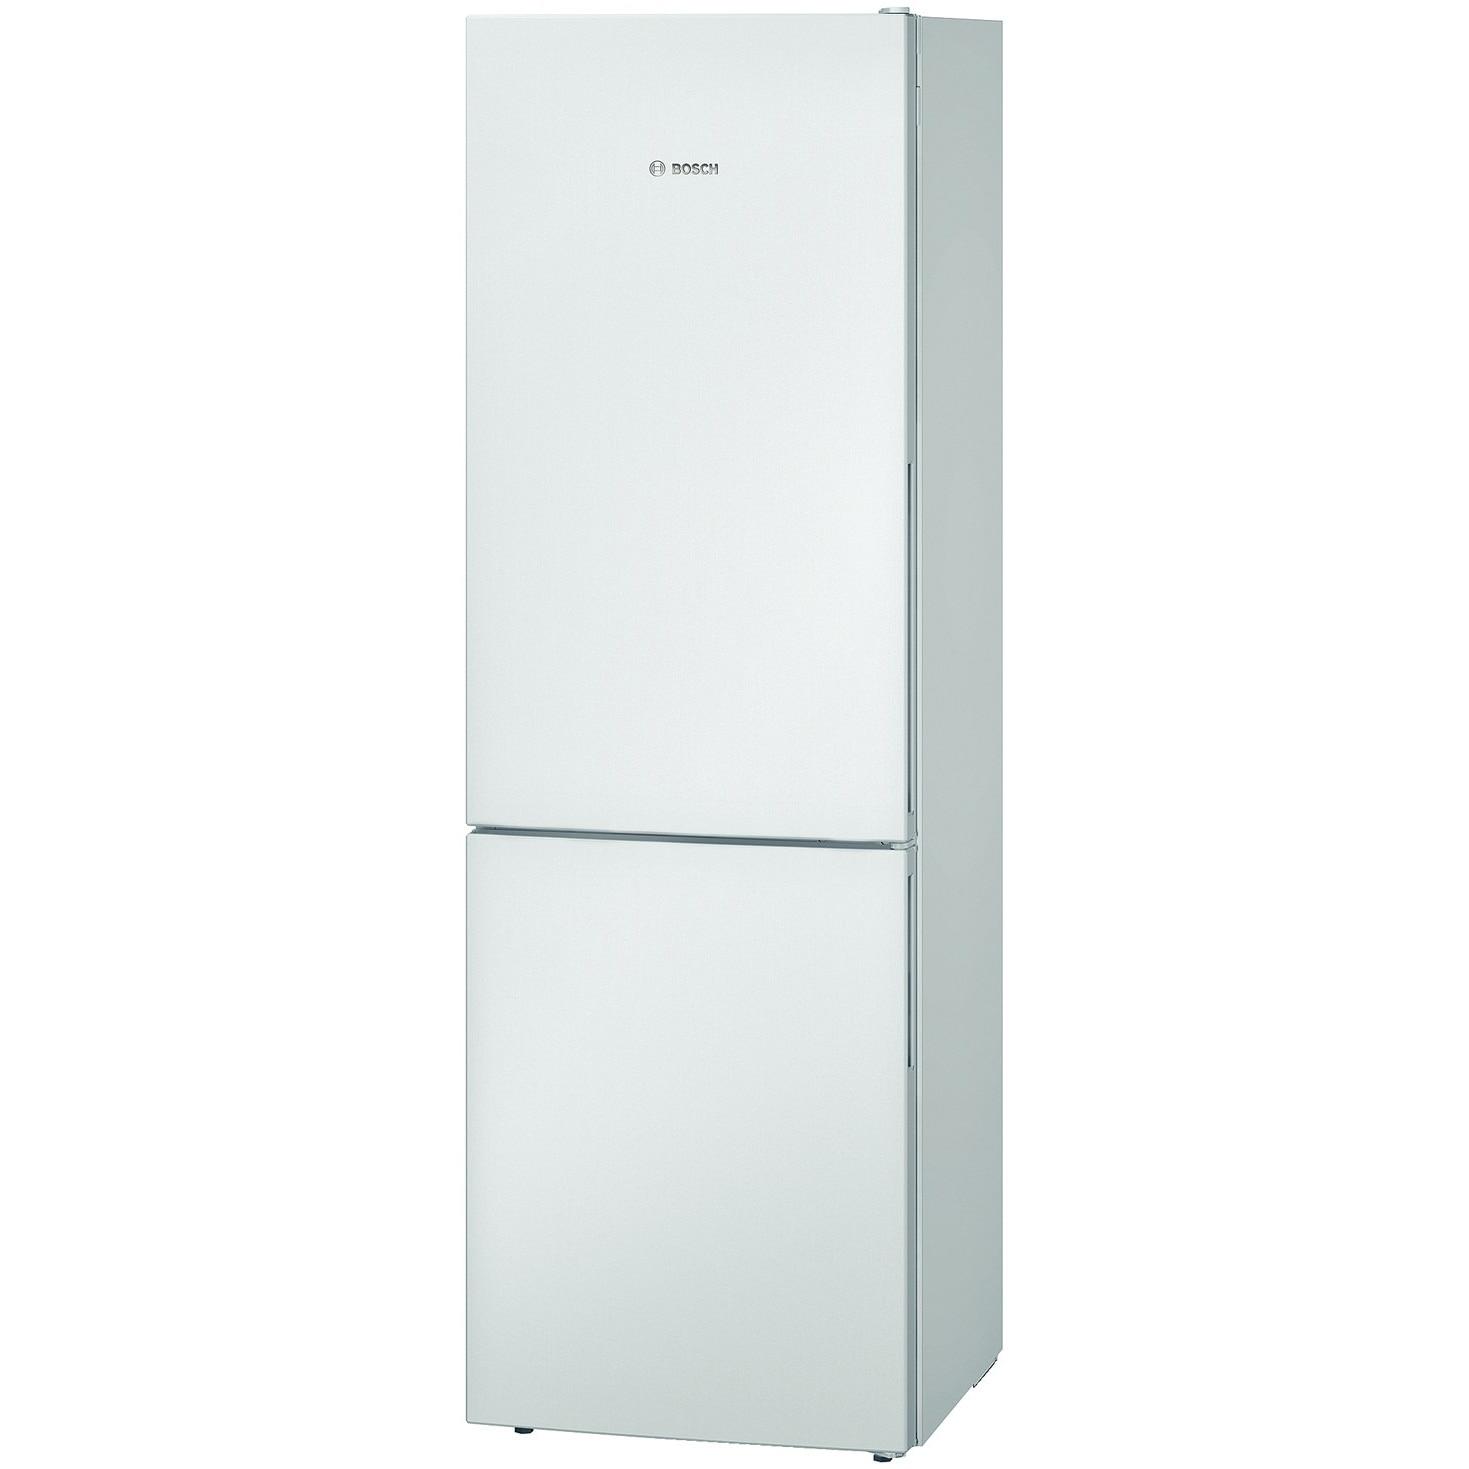 Fotografie Combina frigorifica Bosch KGV36UW30, 309 l, Clasa A++, Low Frost, VarioZone, H 186 cm, Alb